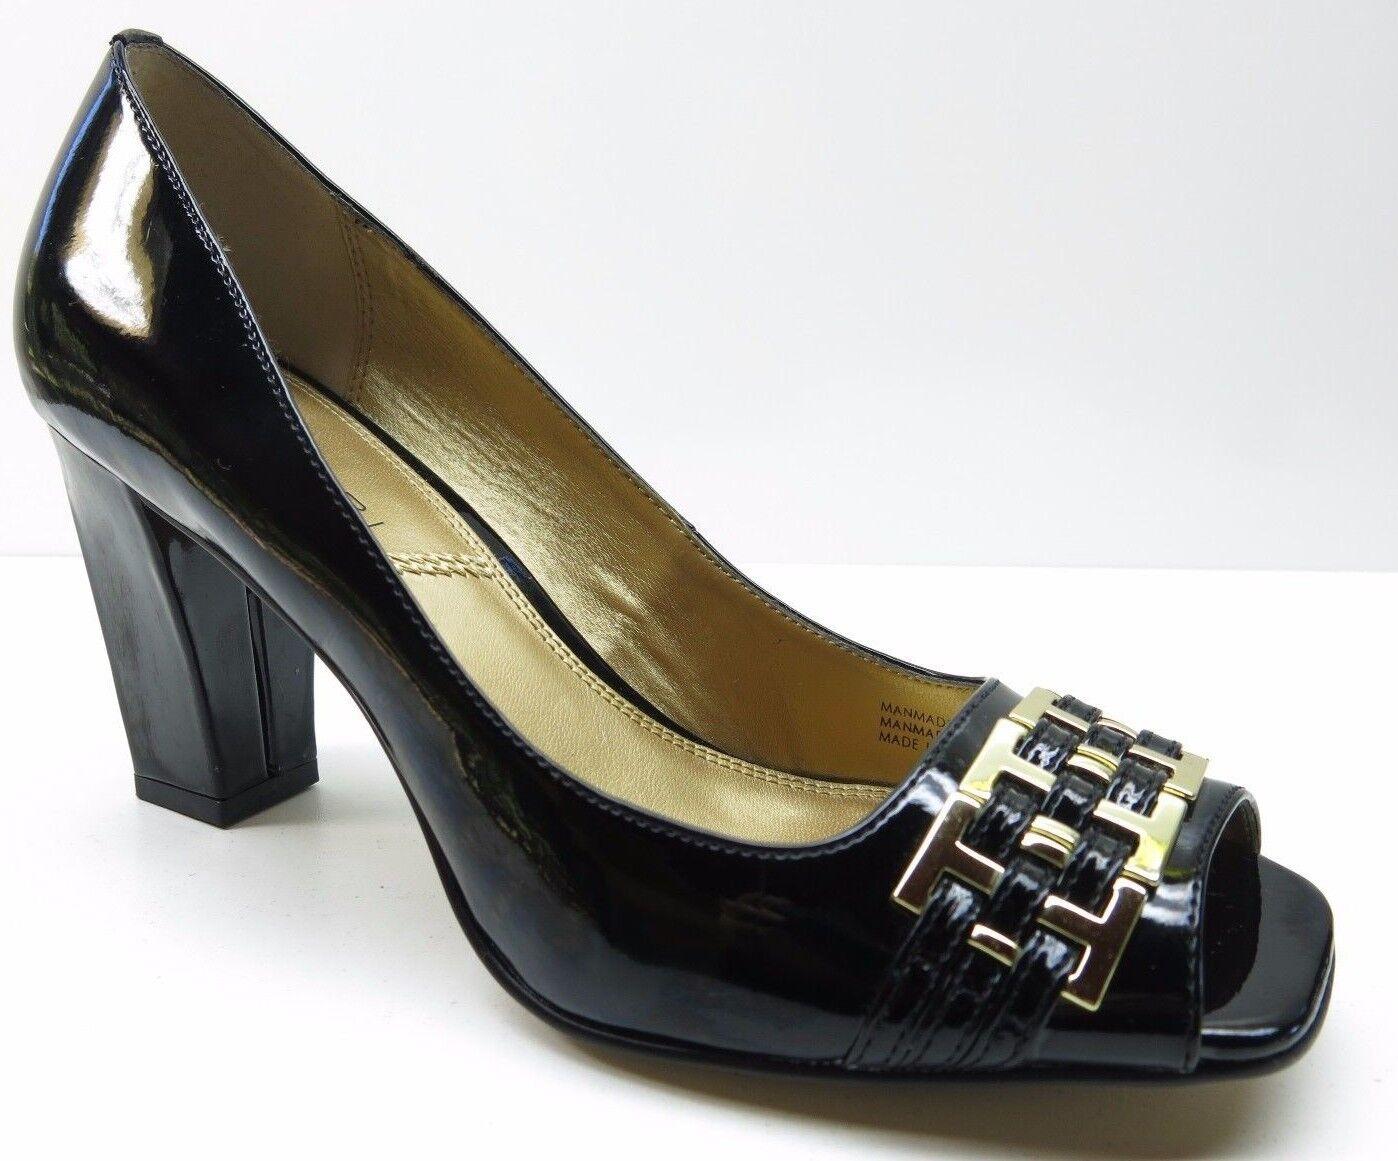 Tahari Pumps Bennett Black Faux Patent Leather Open Toe Dress Pumps Tahari Heels 6.5 MSRP $79 29ee02